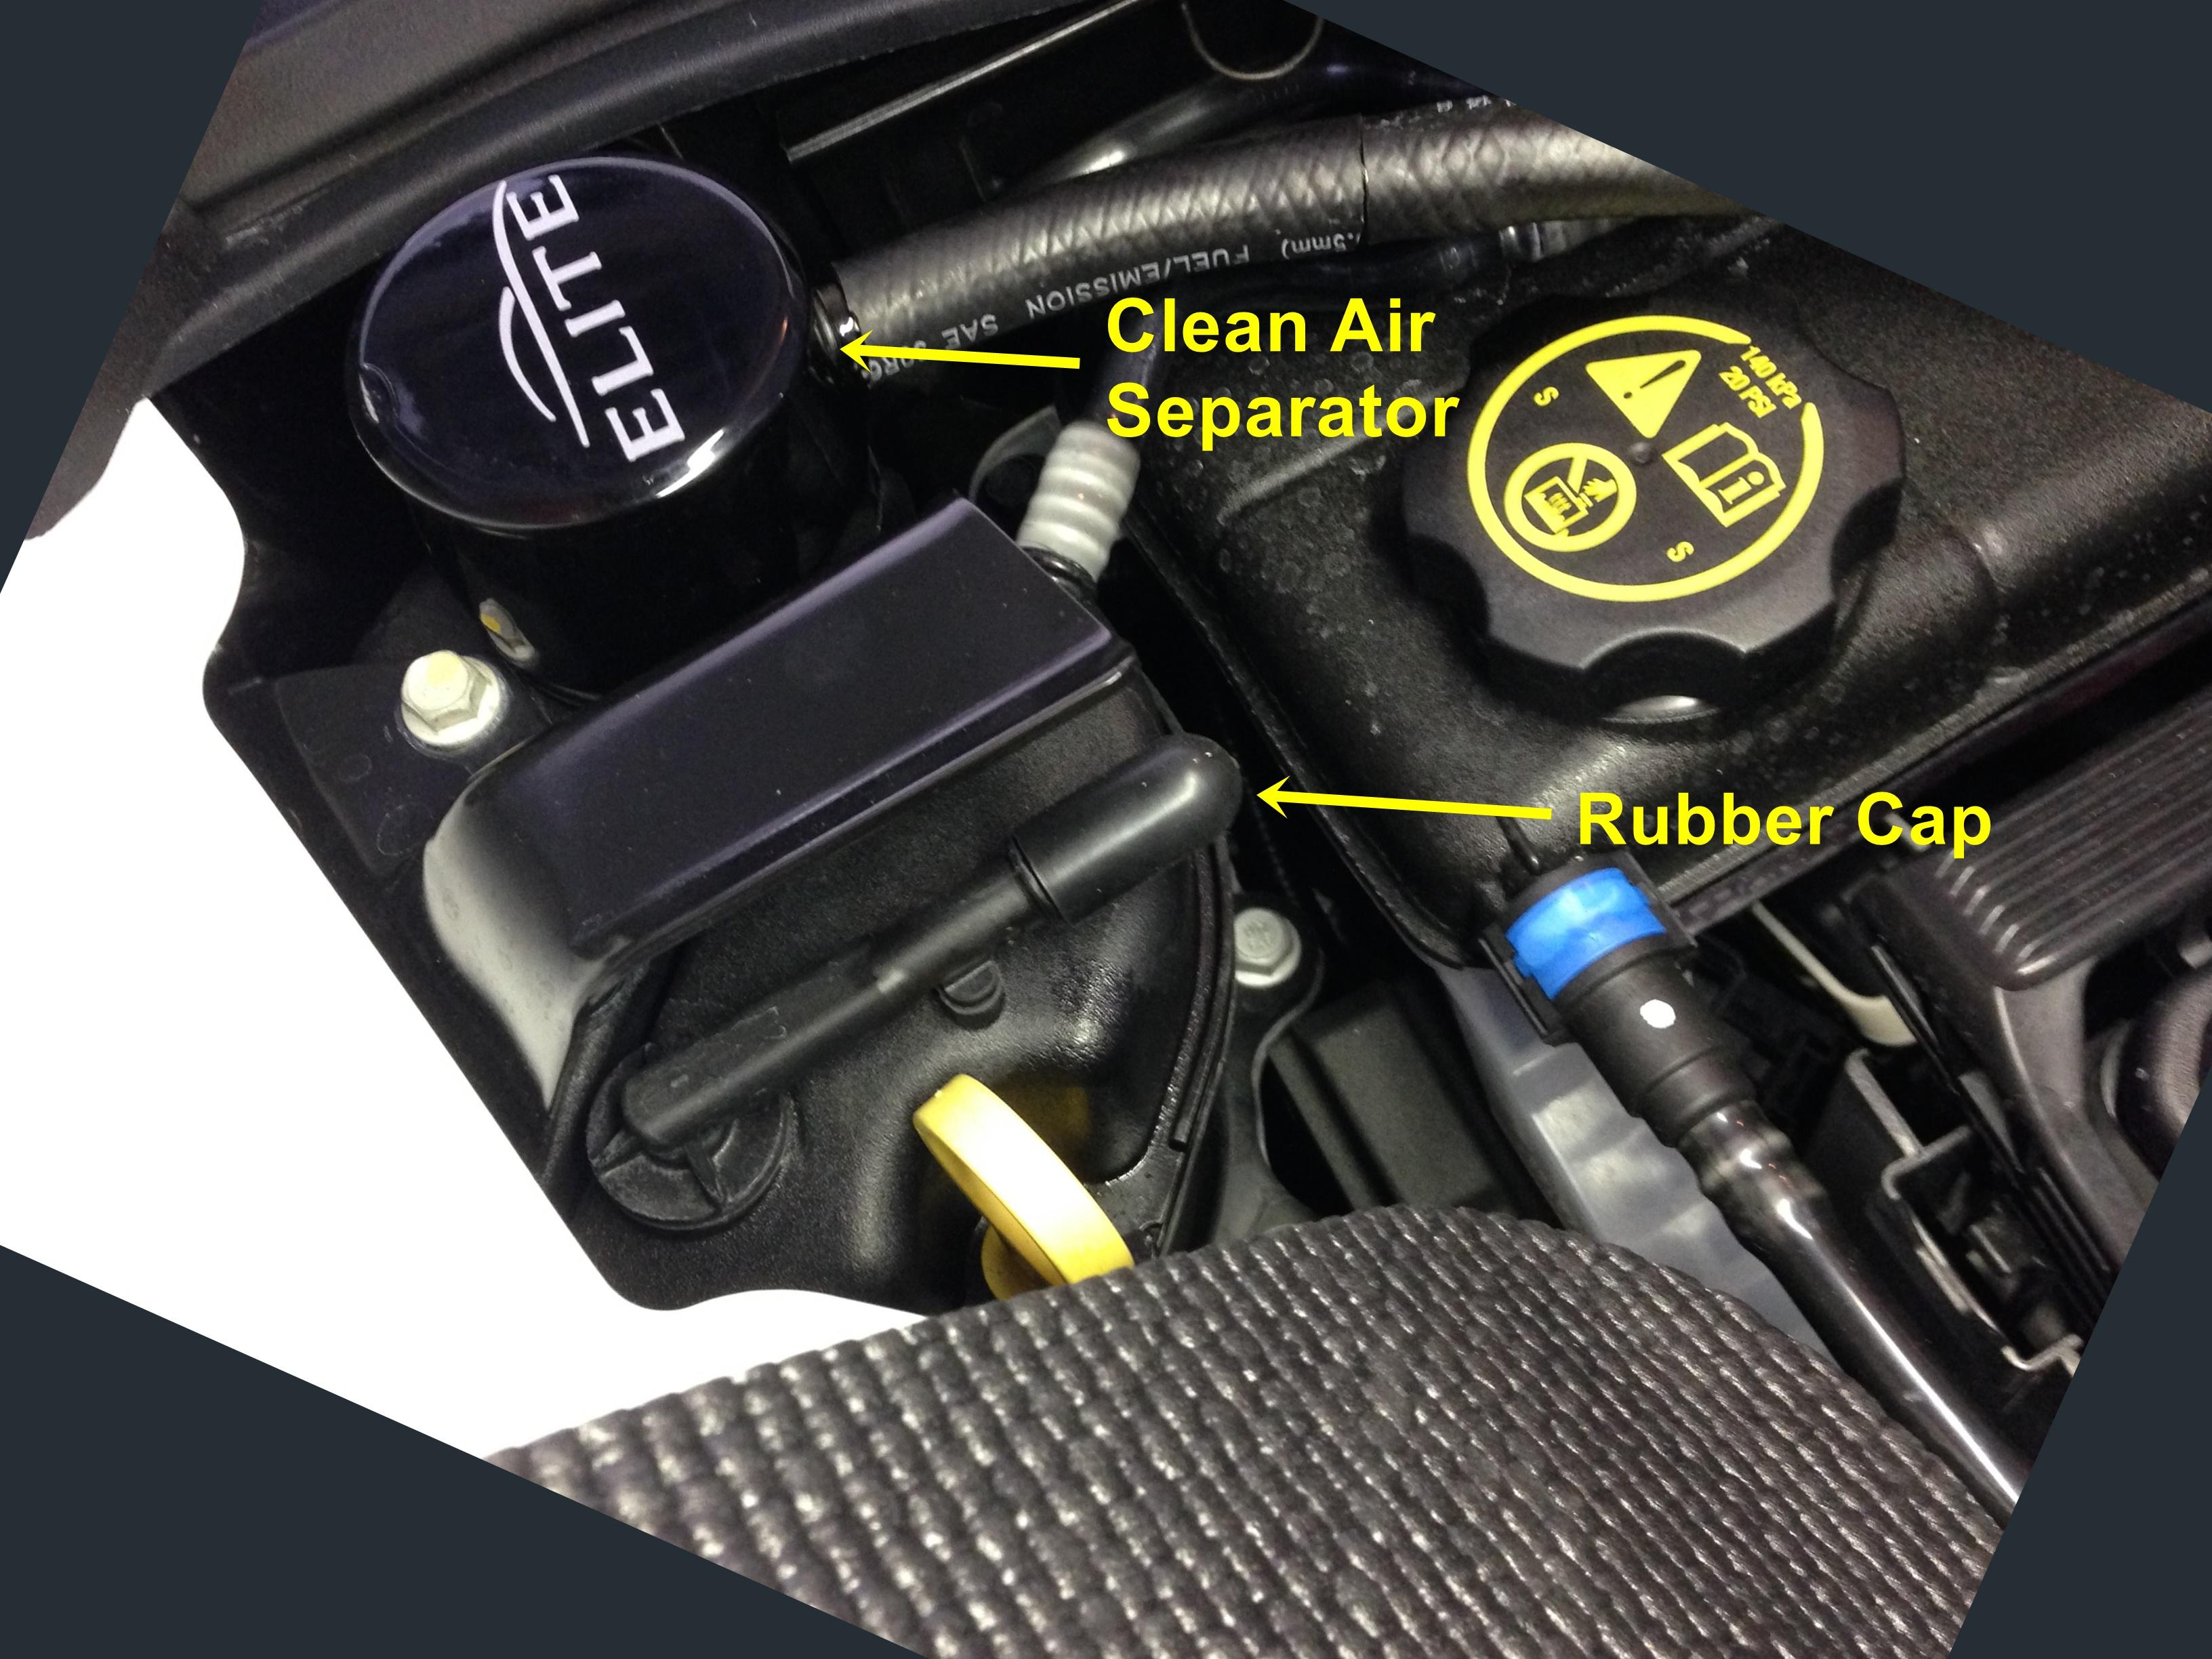 clean-air-separator.jpg